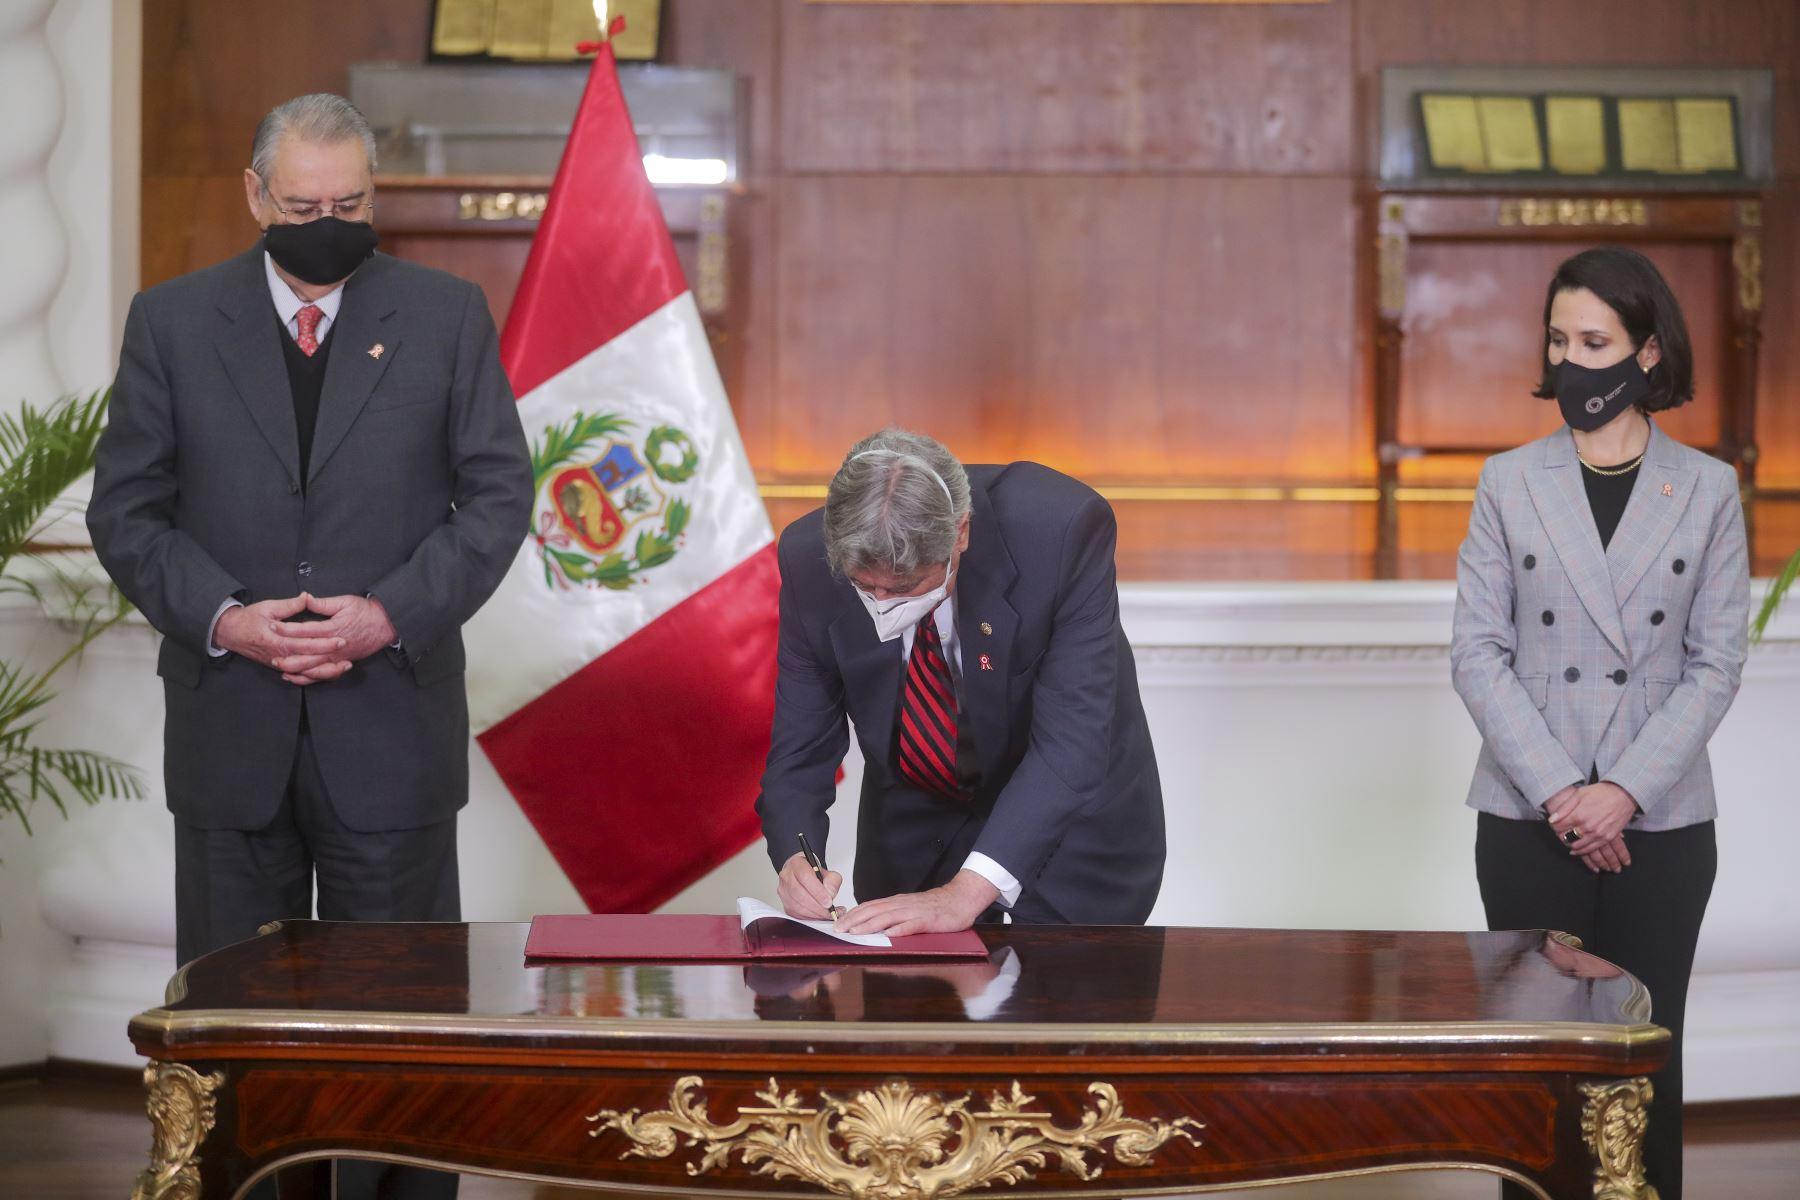 Photo: ANDINA/Presidency of the Republic of Peru